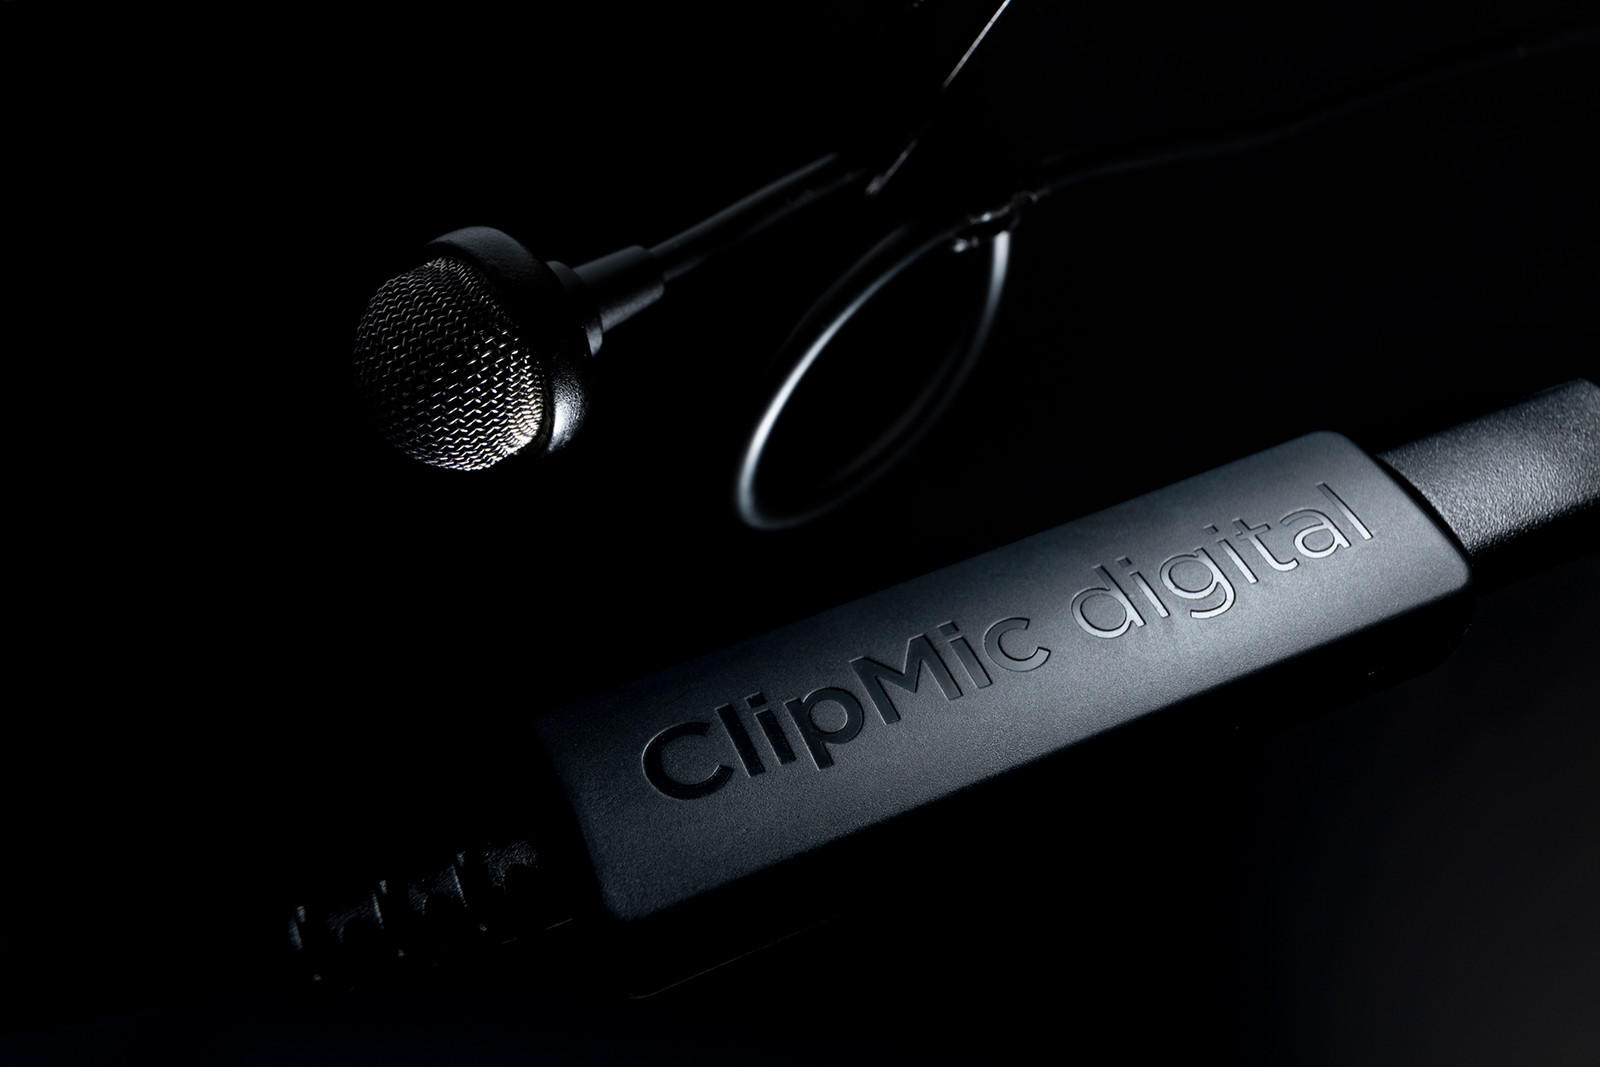 APOGEE CLIPMIC DIGITAL